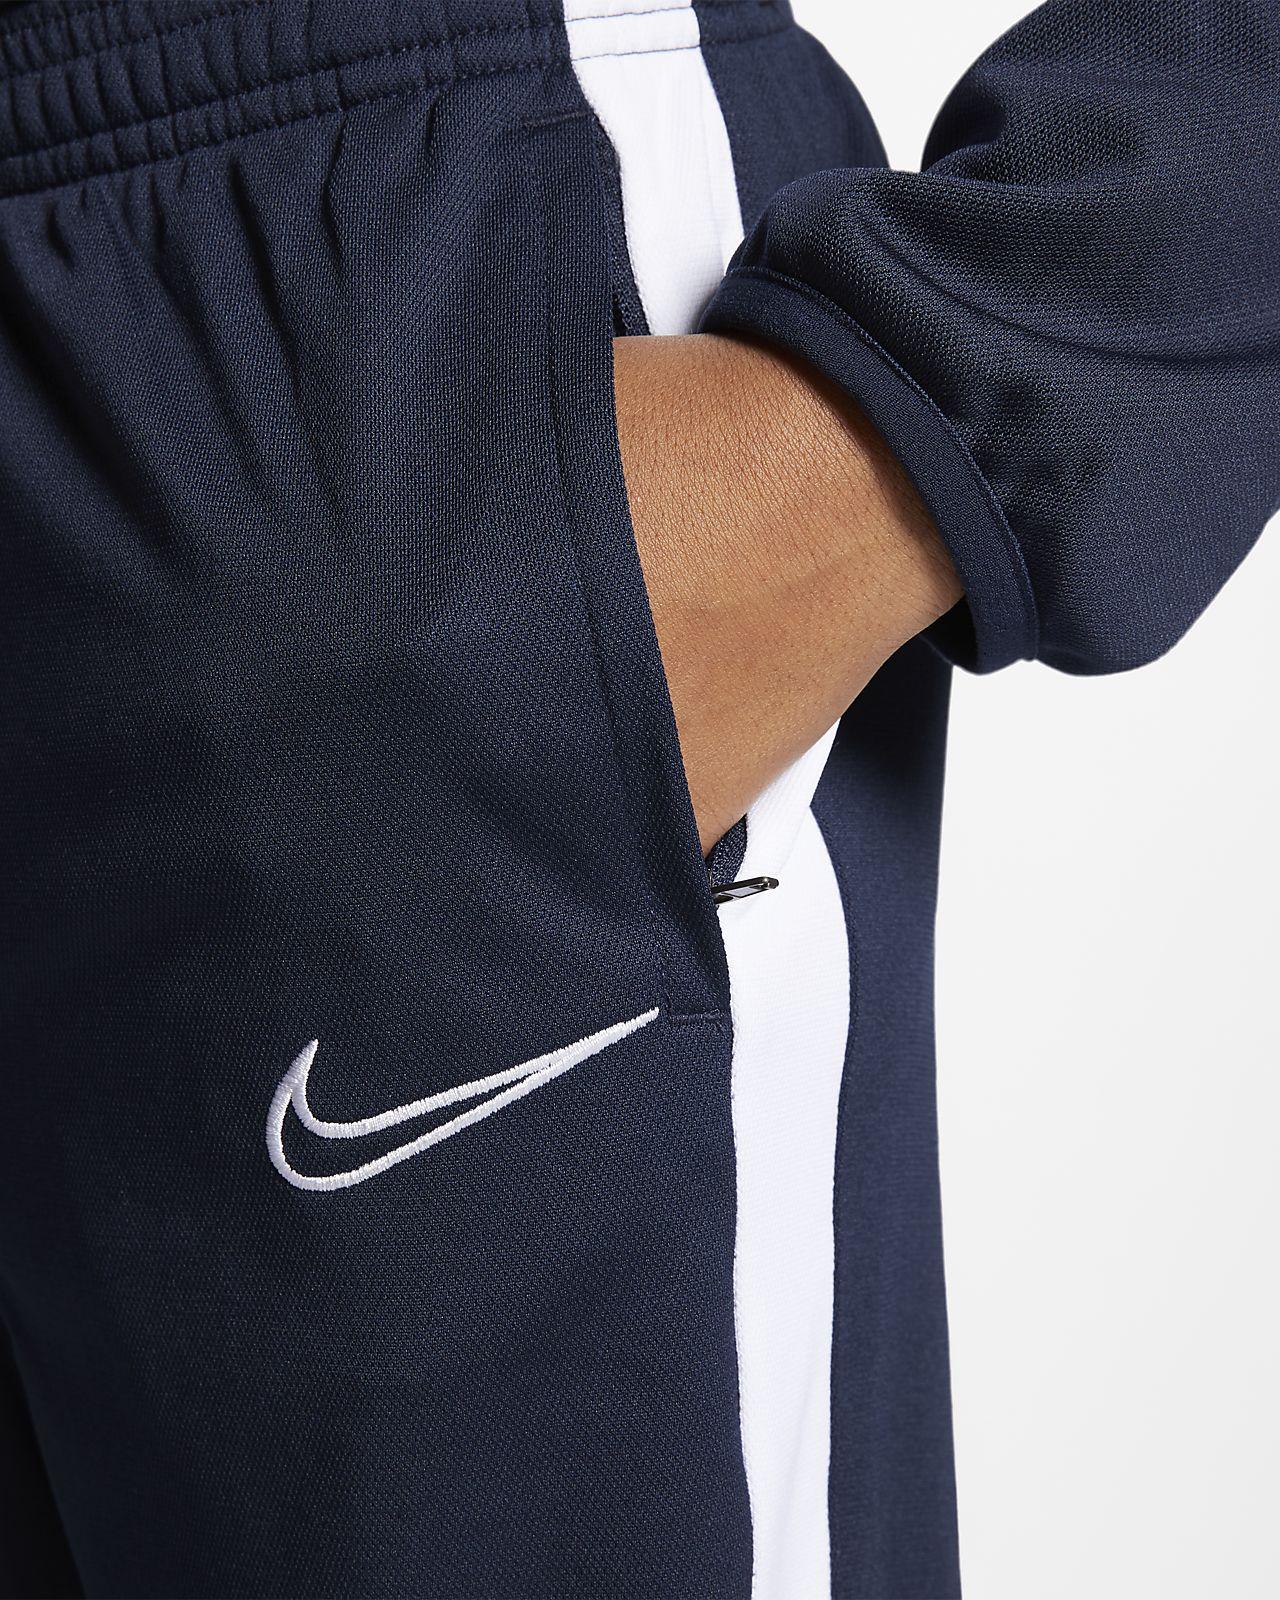 Nike Dri FIT Academy Fußball Trainingsanzug für ältere Kinder